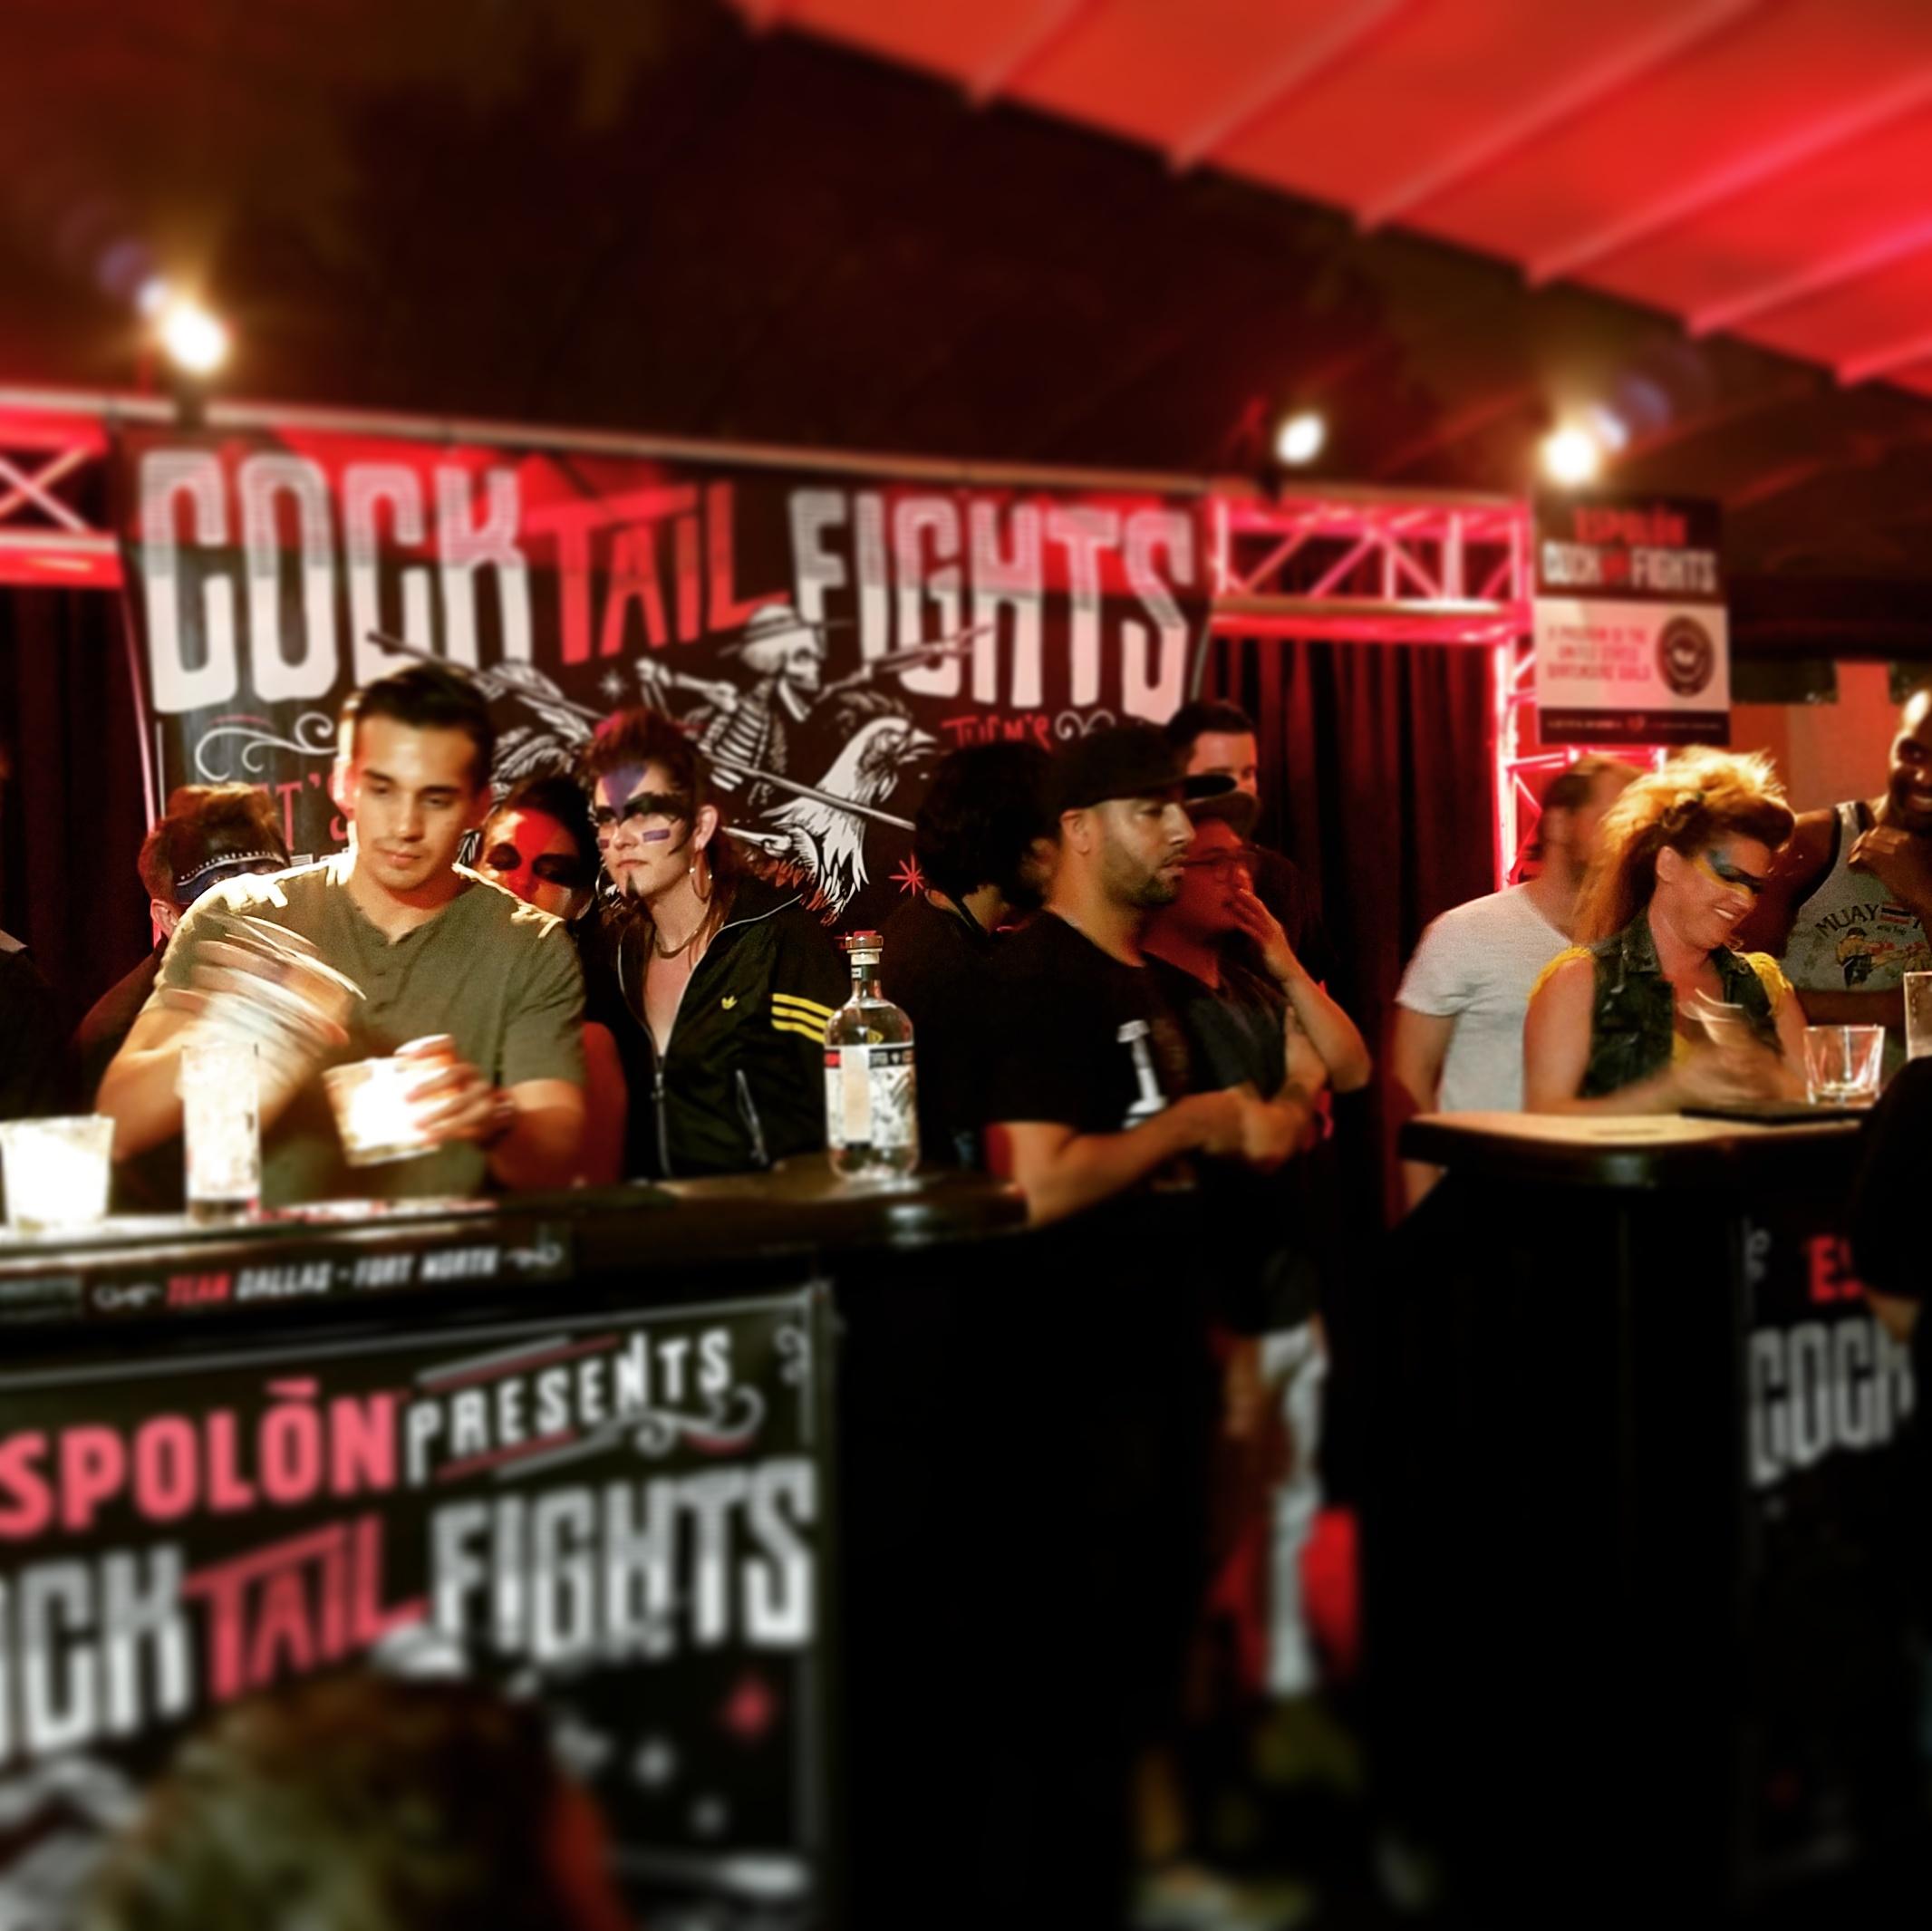 Espolon Cocktail Fight 2016